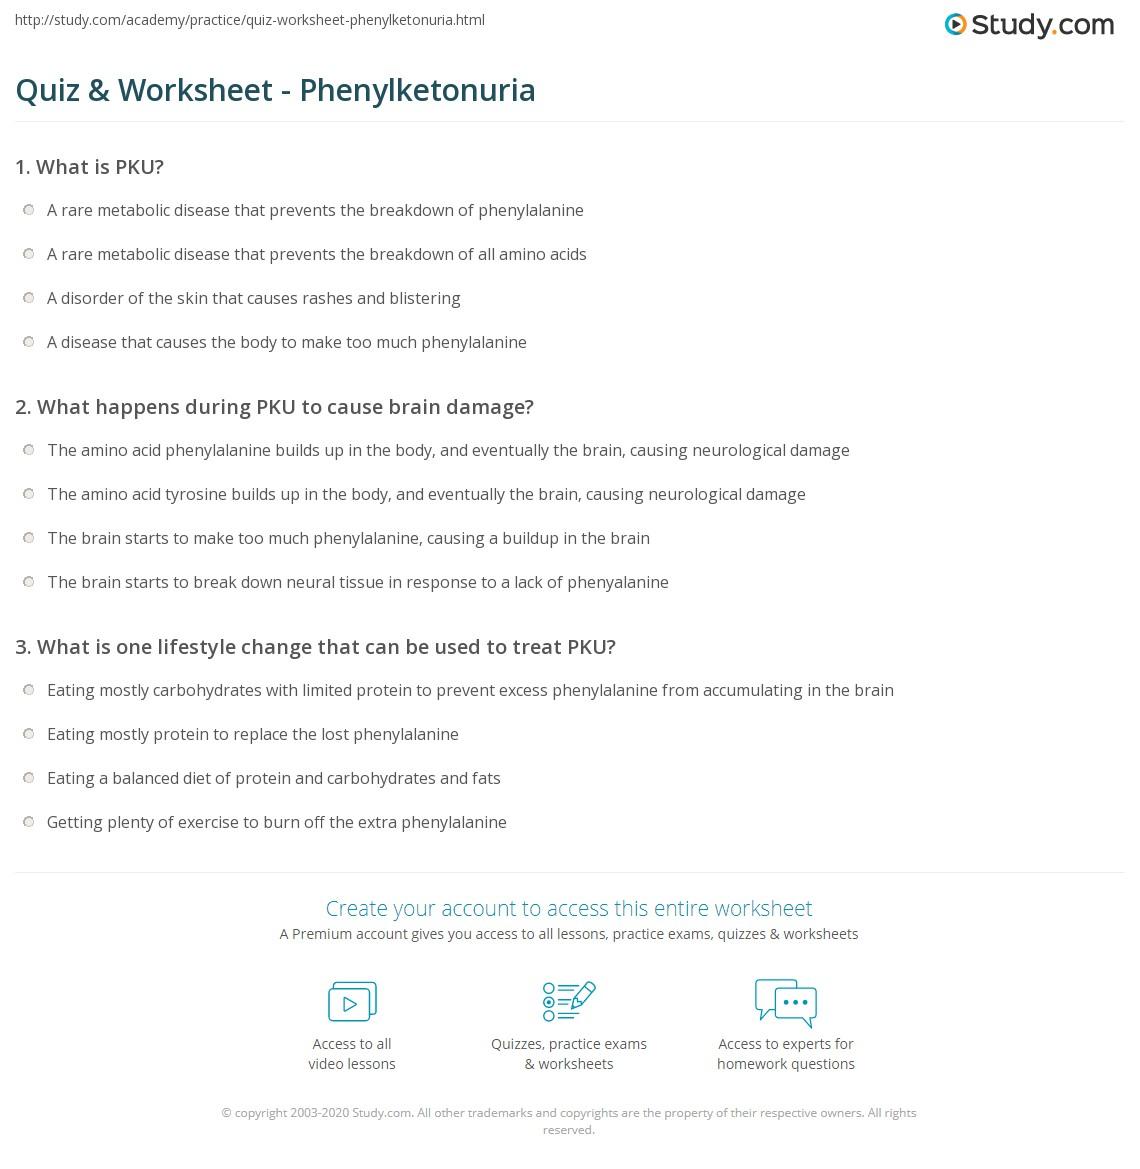 Quiz & Worksheet - Phenylketonuria | Study com